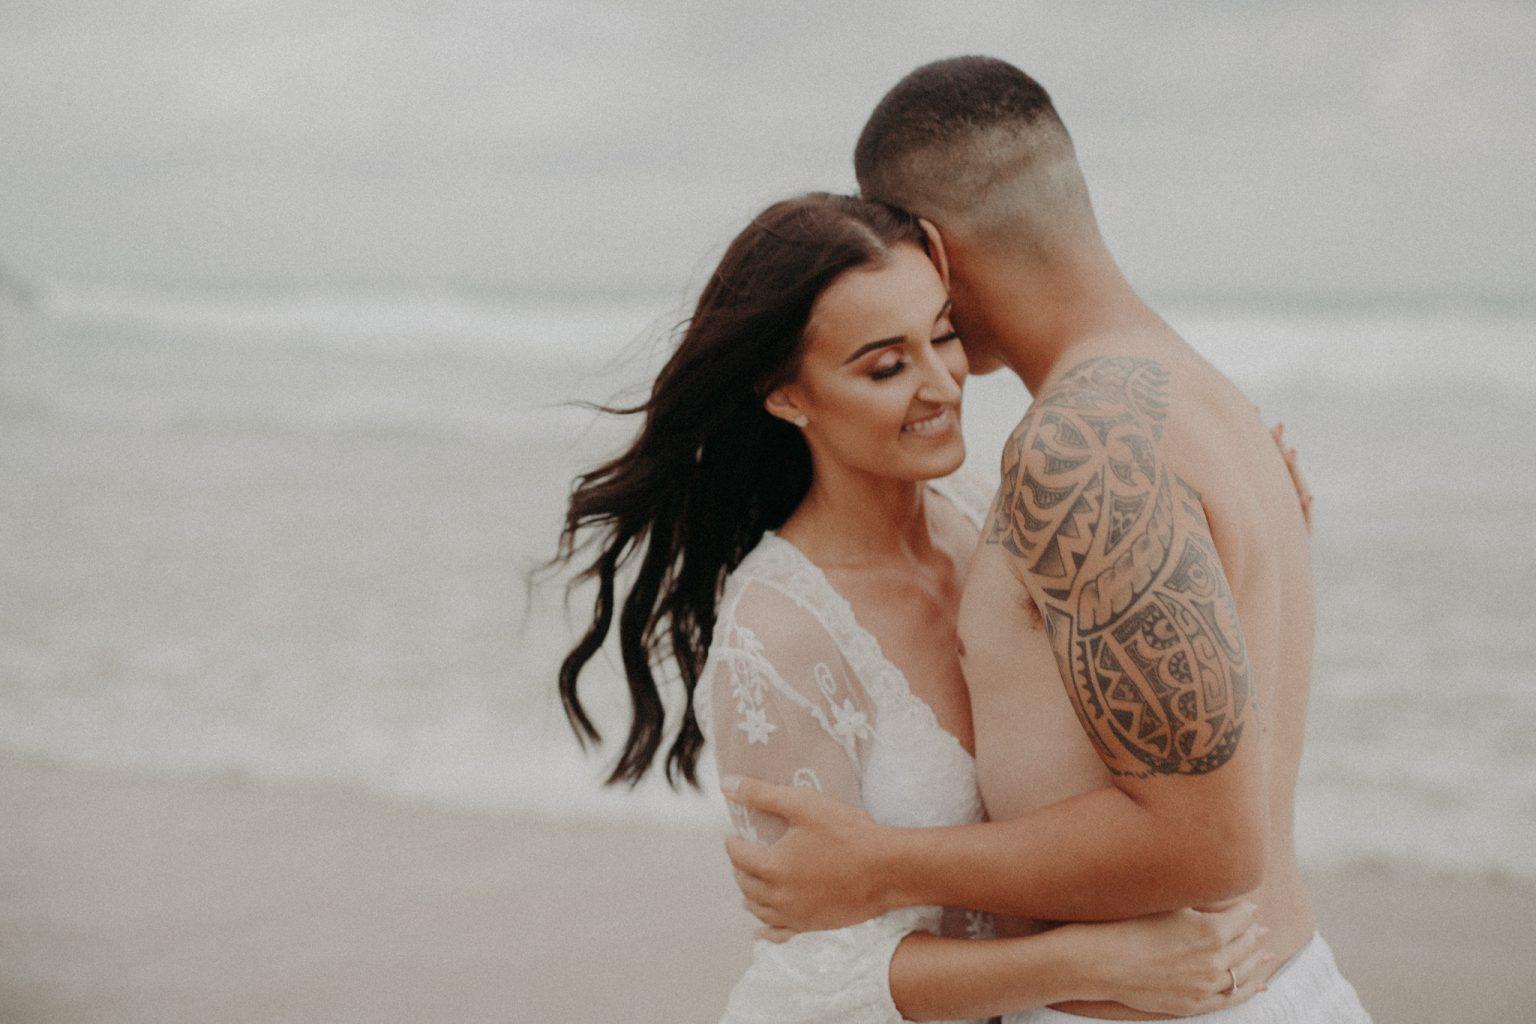 tattooed man and woman wearing lace on beach